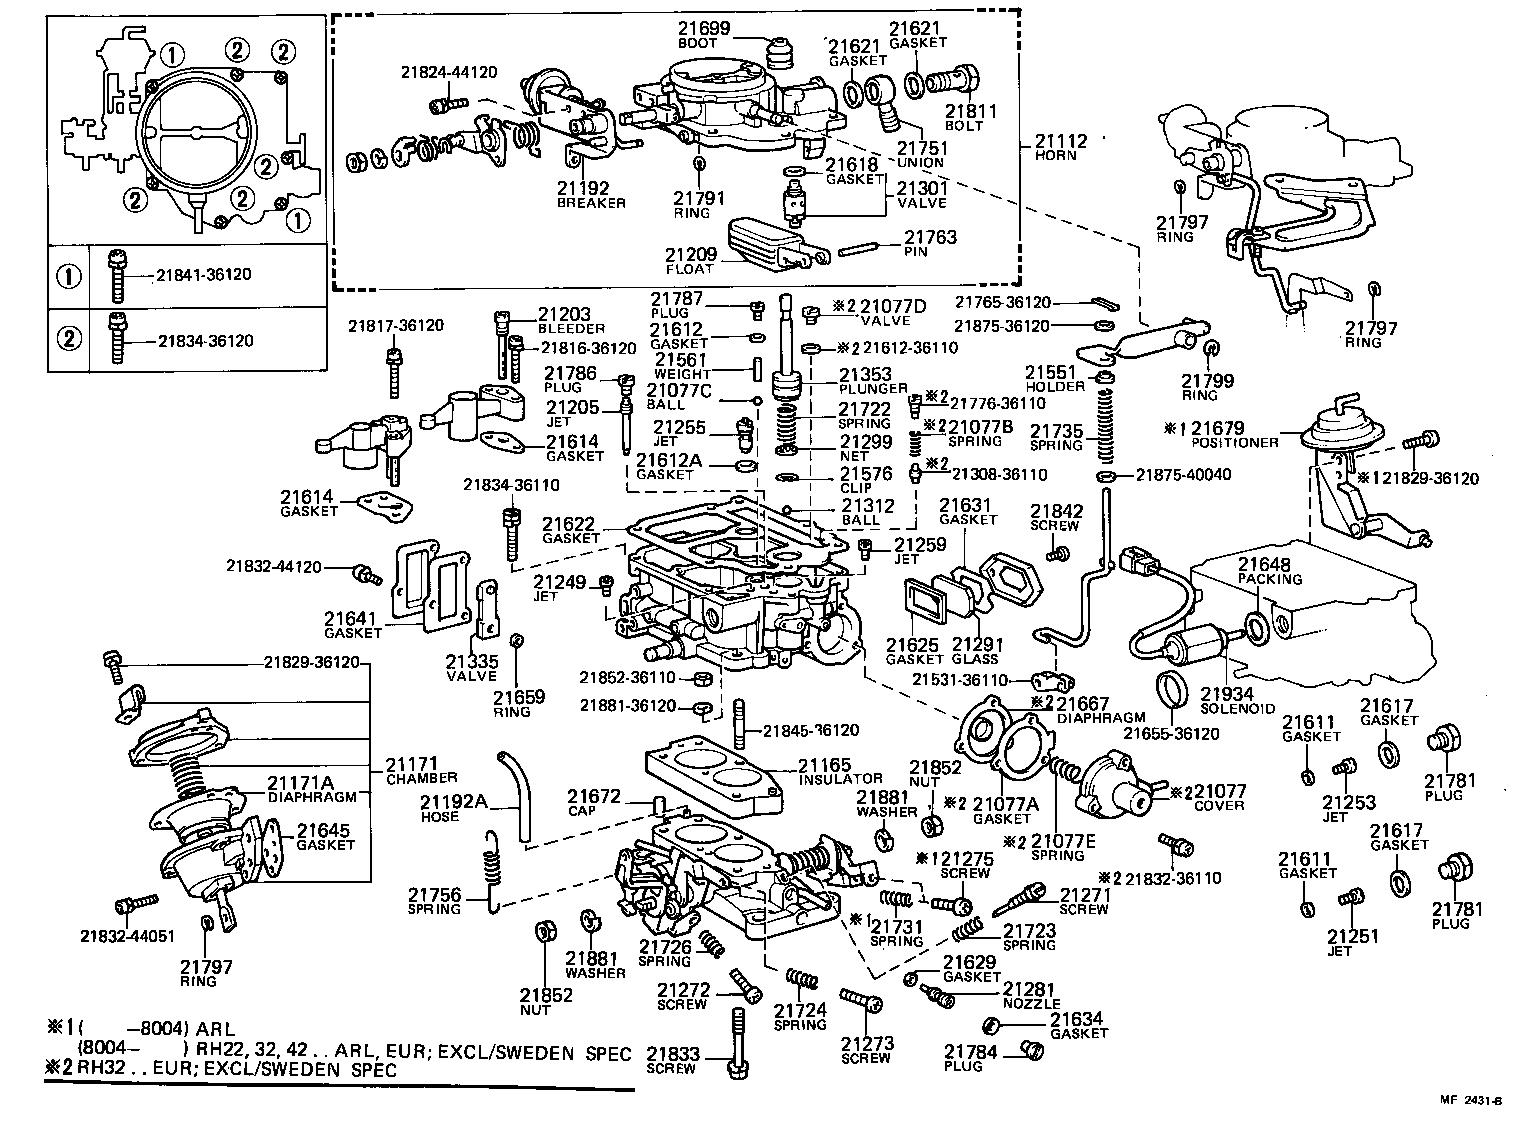 toyota hiacerh32lv-jre - tool-engine-fuel